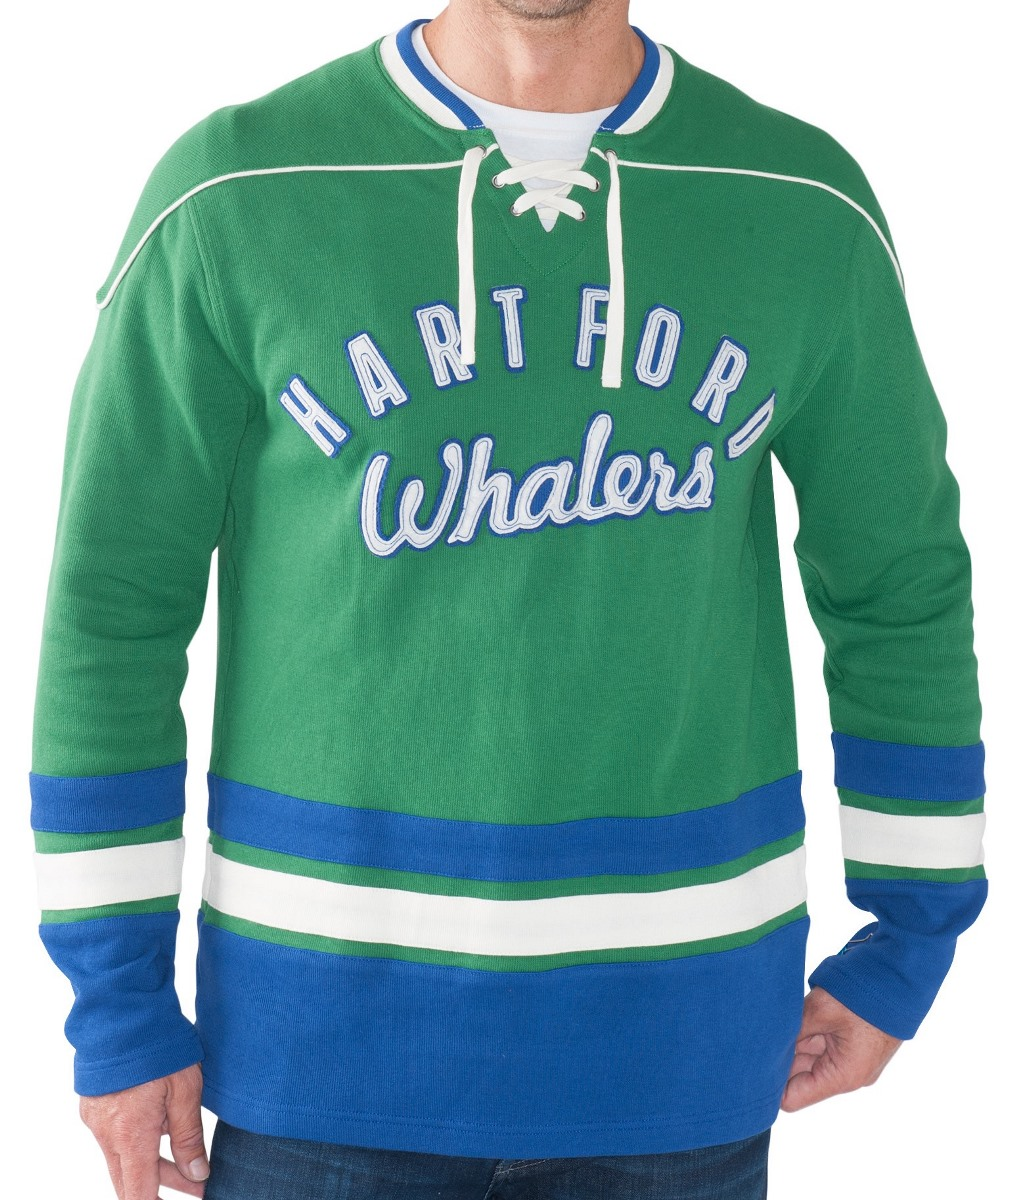 "Hartford Whalers NHL Men's G-III ""Defenseman"" Knit Rib Crew Skate Lace Shirt by G-III Sports"